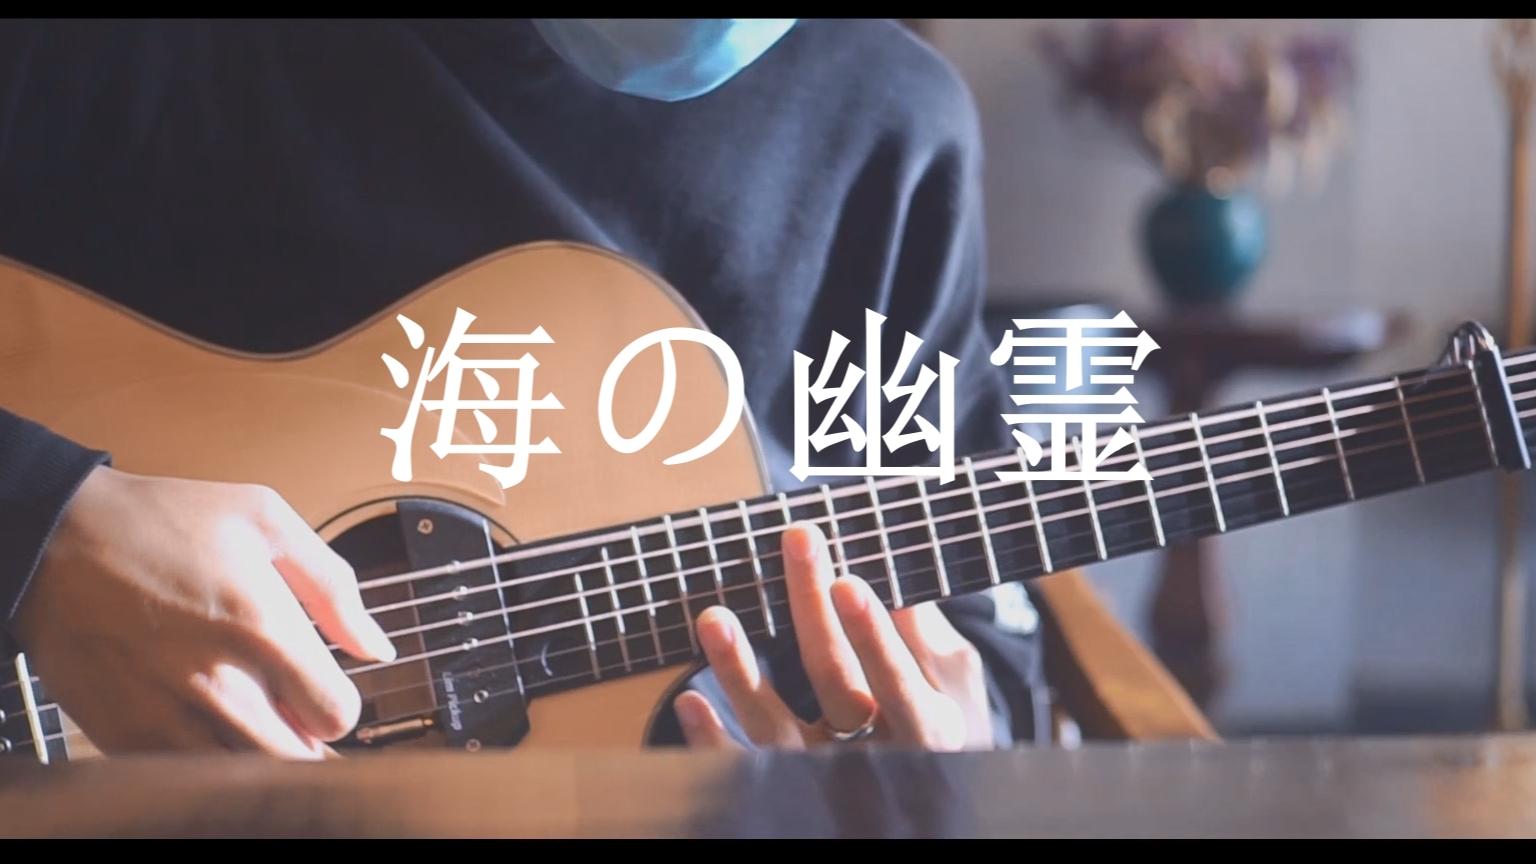 超燃! - 「海の幽霊」 - 学琴一周年作 -木吉他演奏 - 指弹